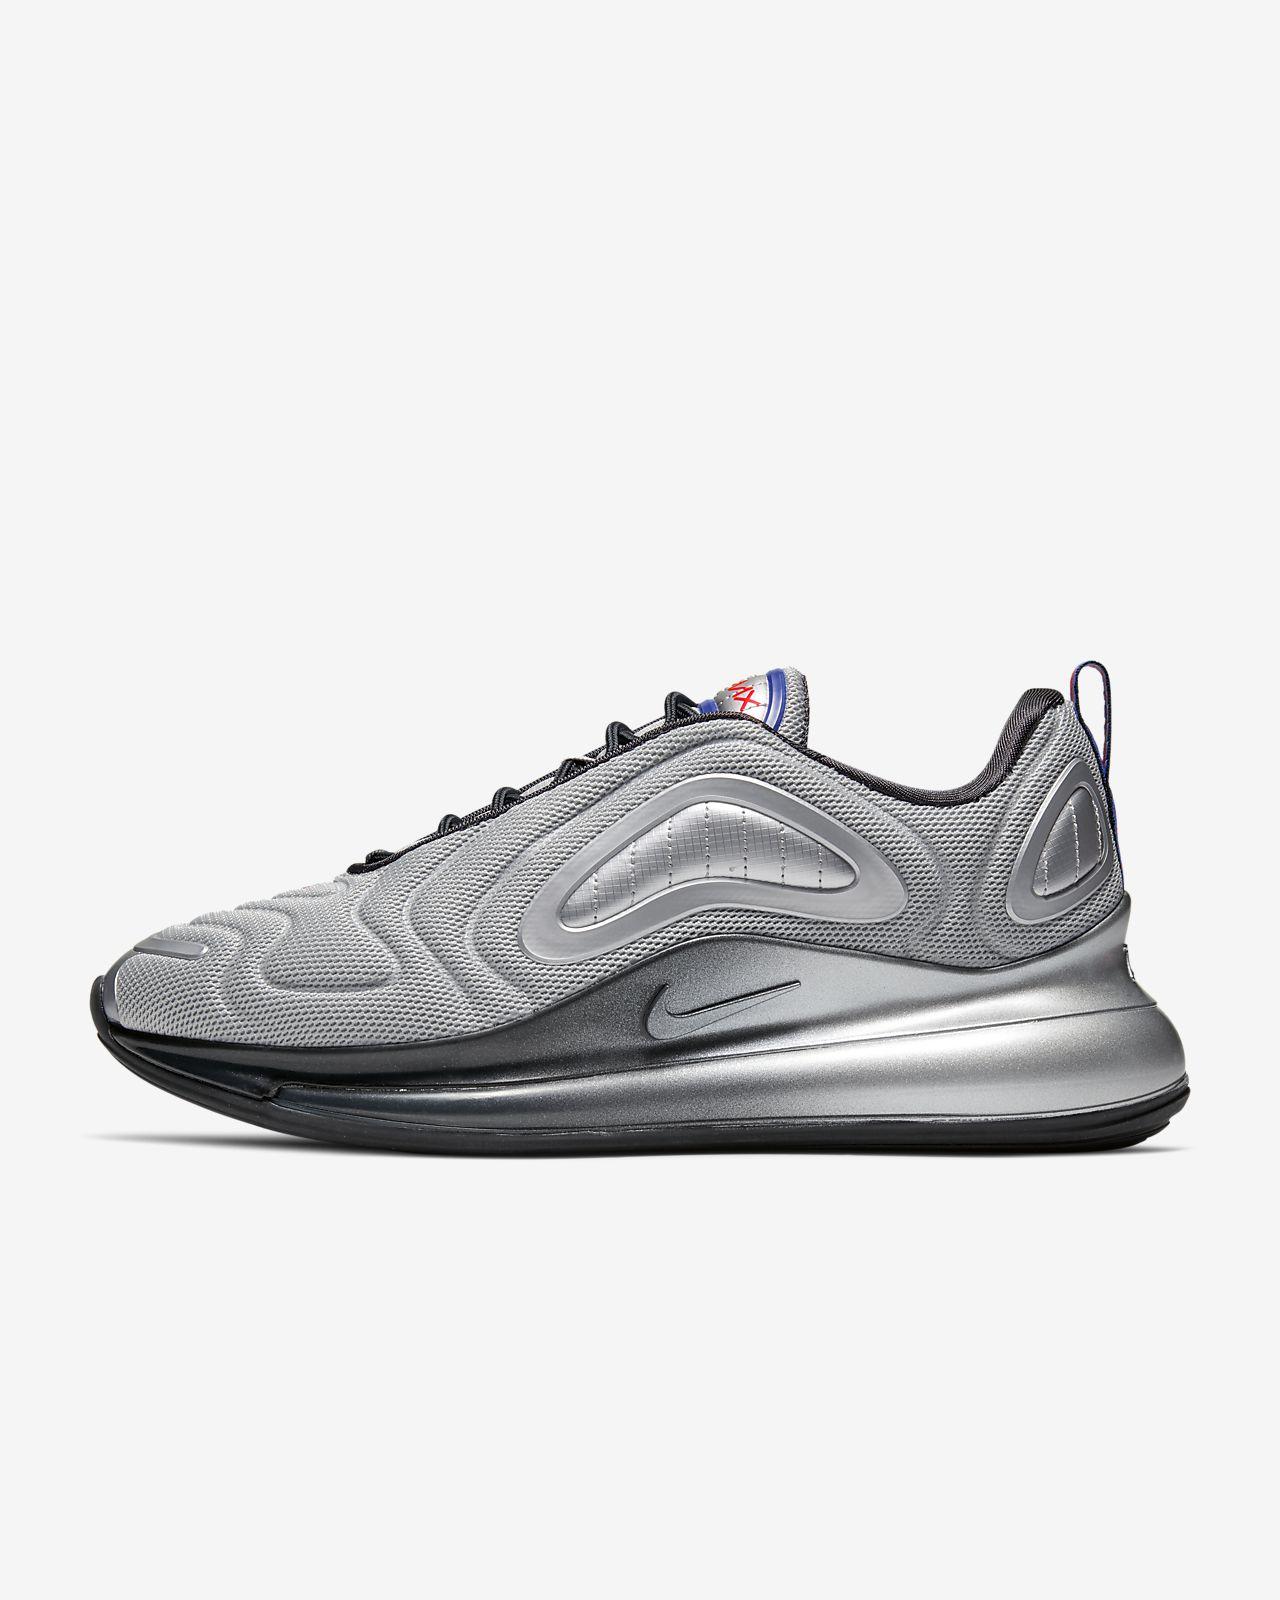 Chaussure Nike Air Max 720 pour Homme